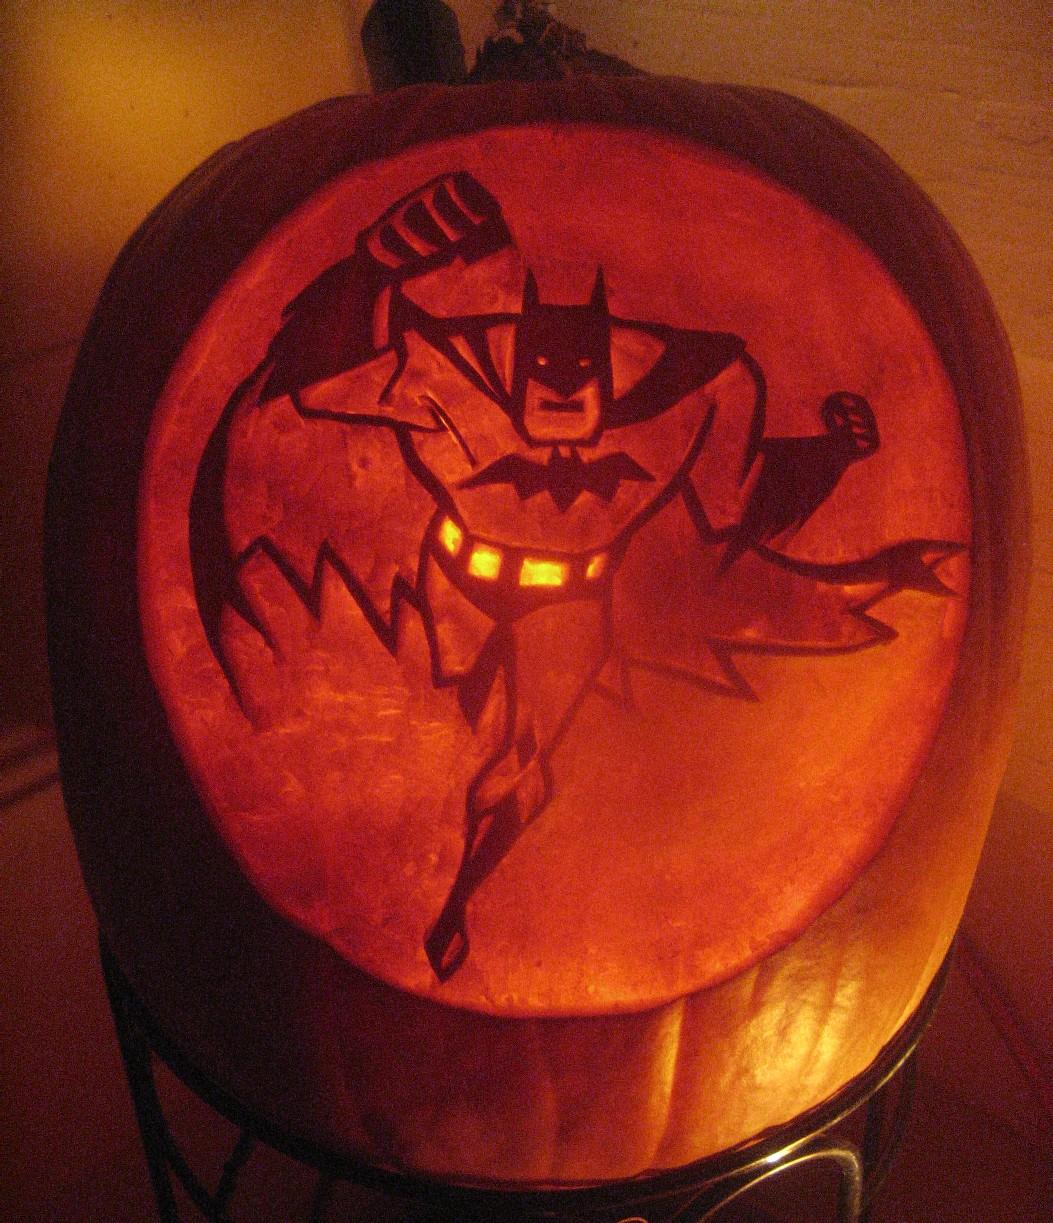 Drawn pumpkin halloween decoration Decorating Fantastic Picture Ideas: Image